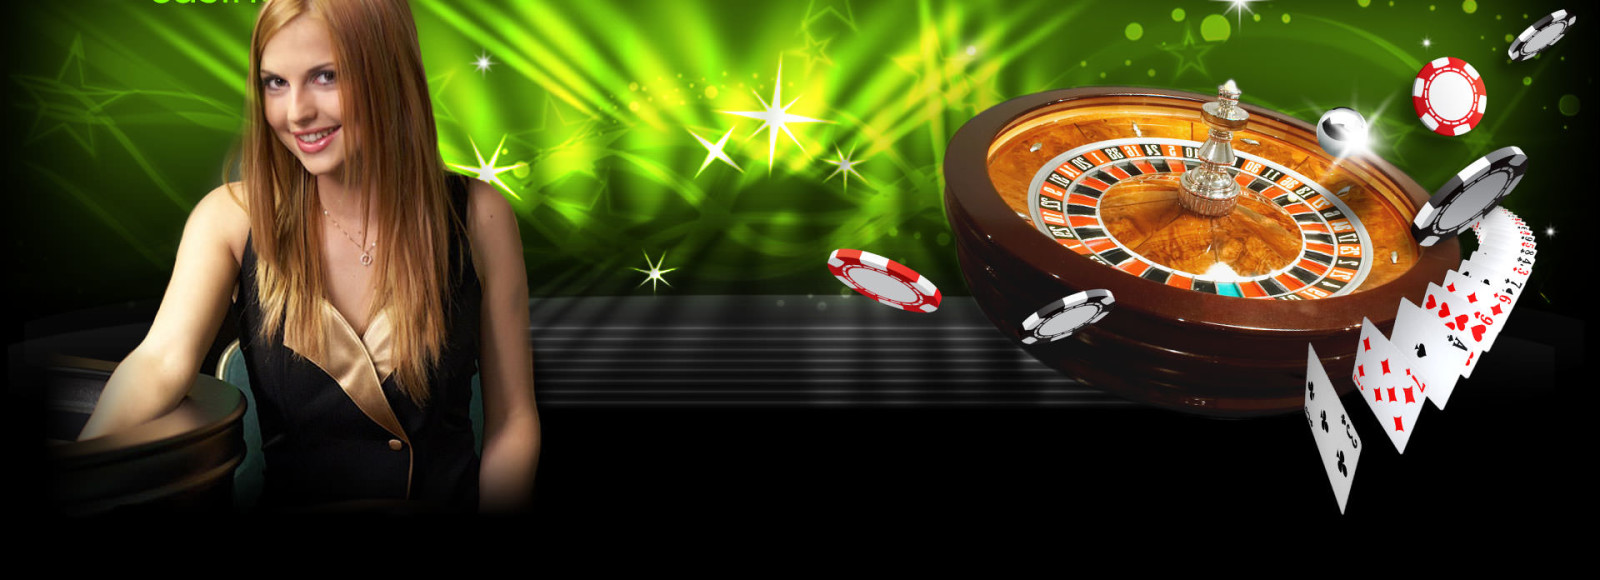 imagesbonus-casino-4.jpg